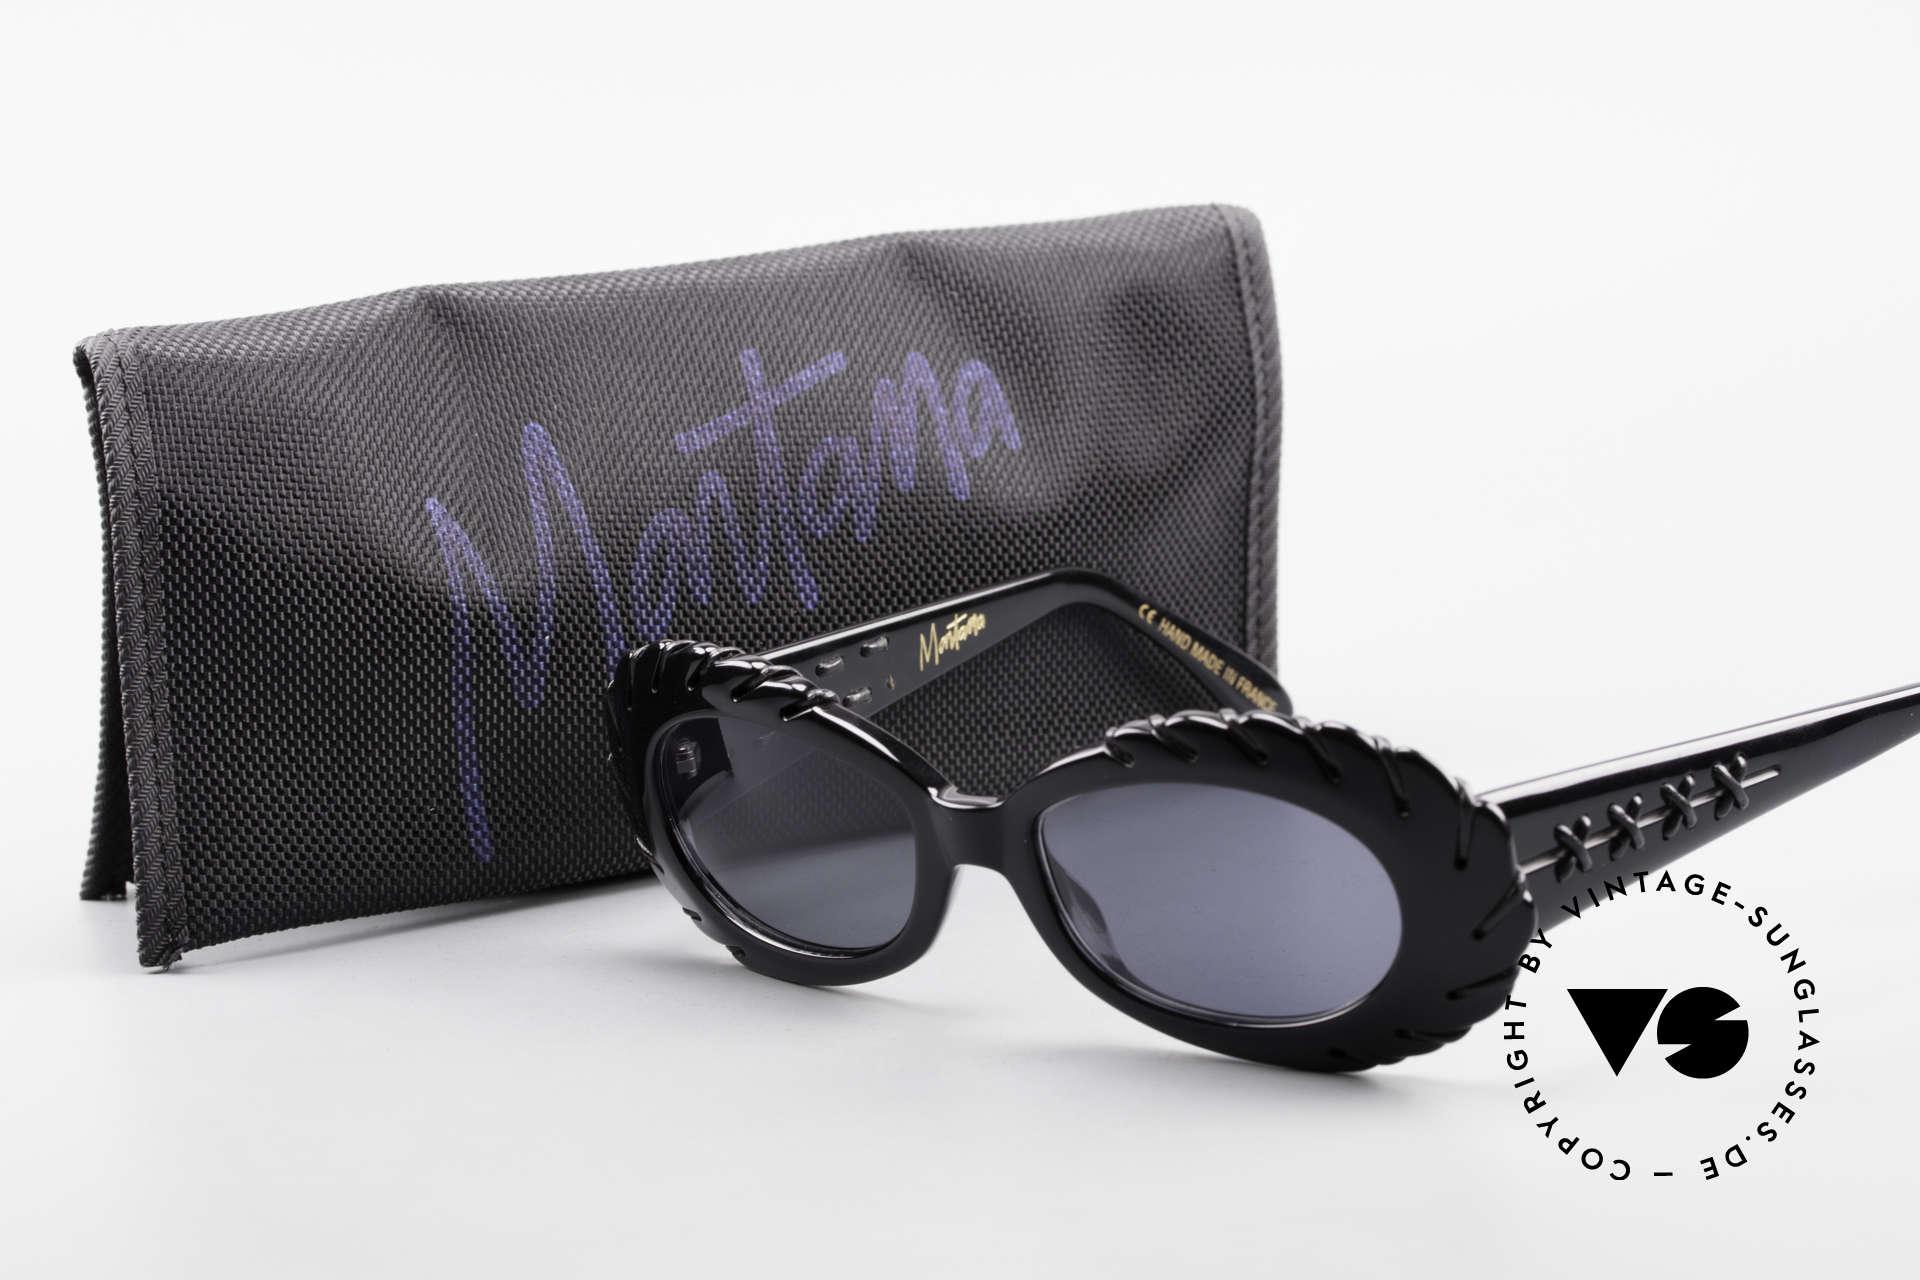 Claude Montana 705 1990's Design by Alain Mikli, NO RETRO fashion-shades, but a unique old ORIGINAL, Made for Women